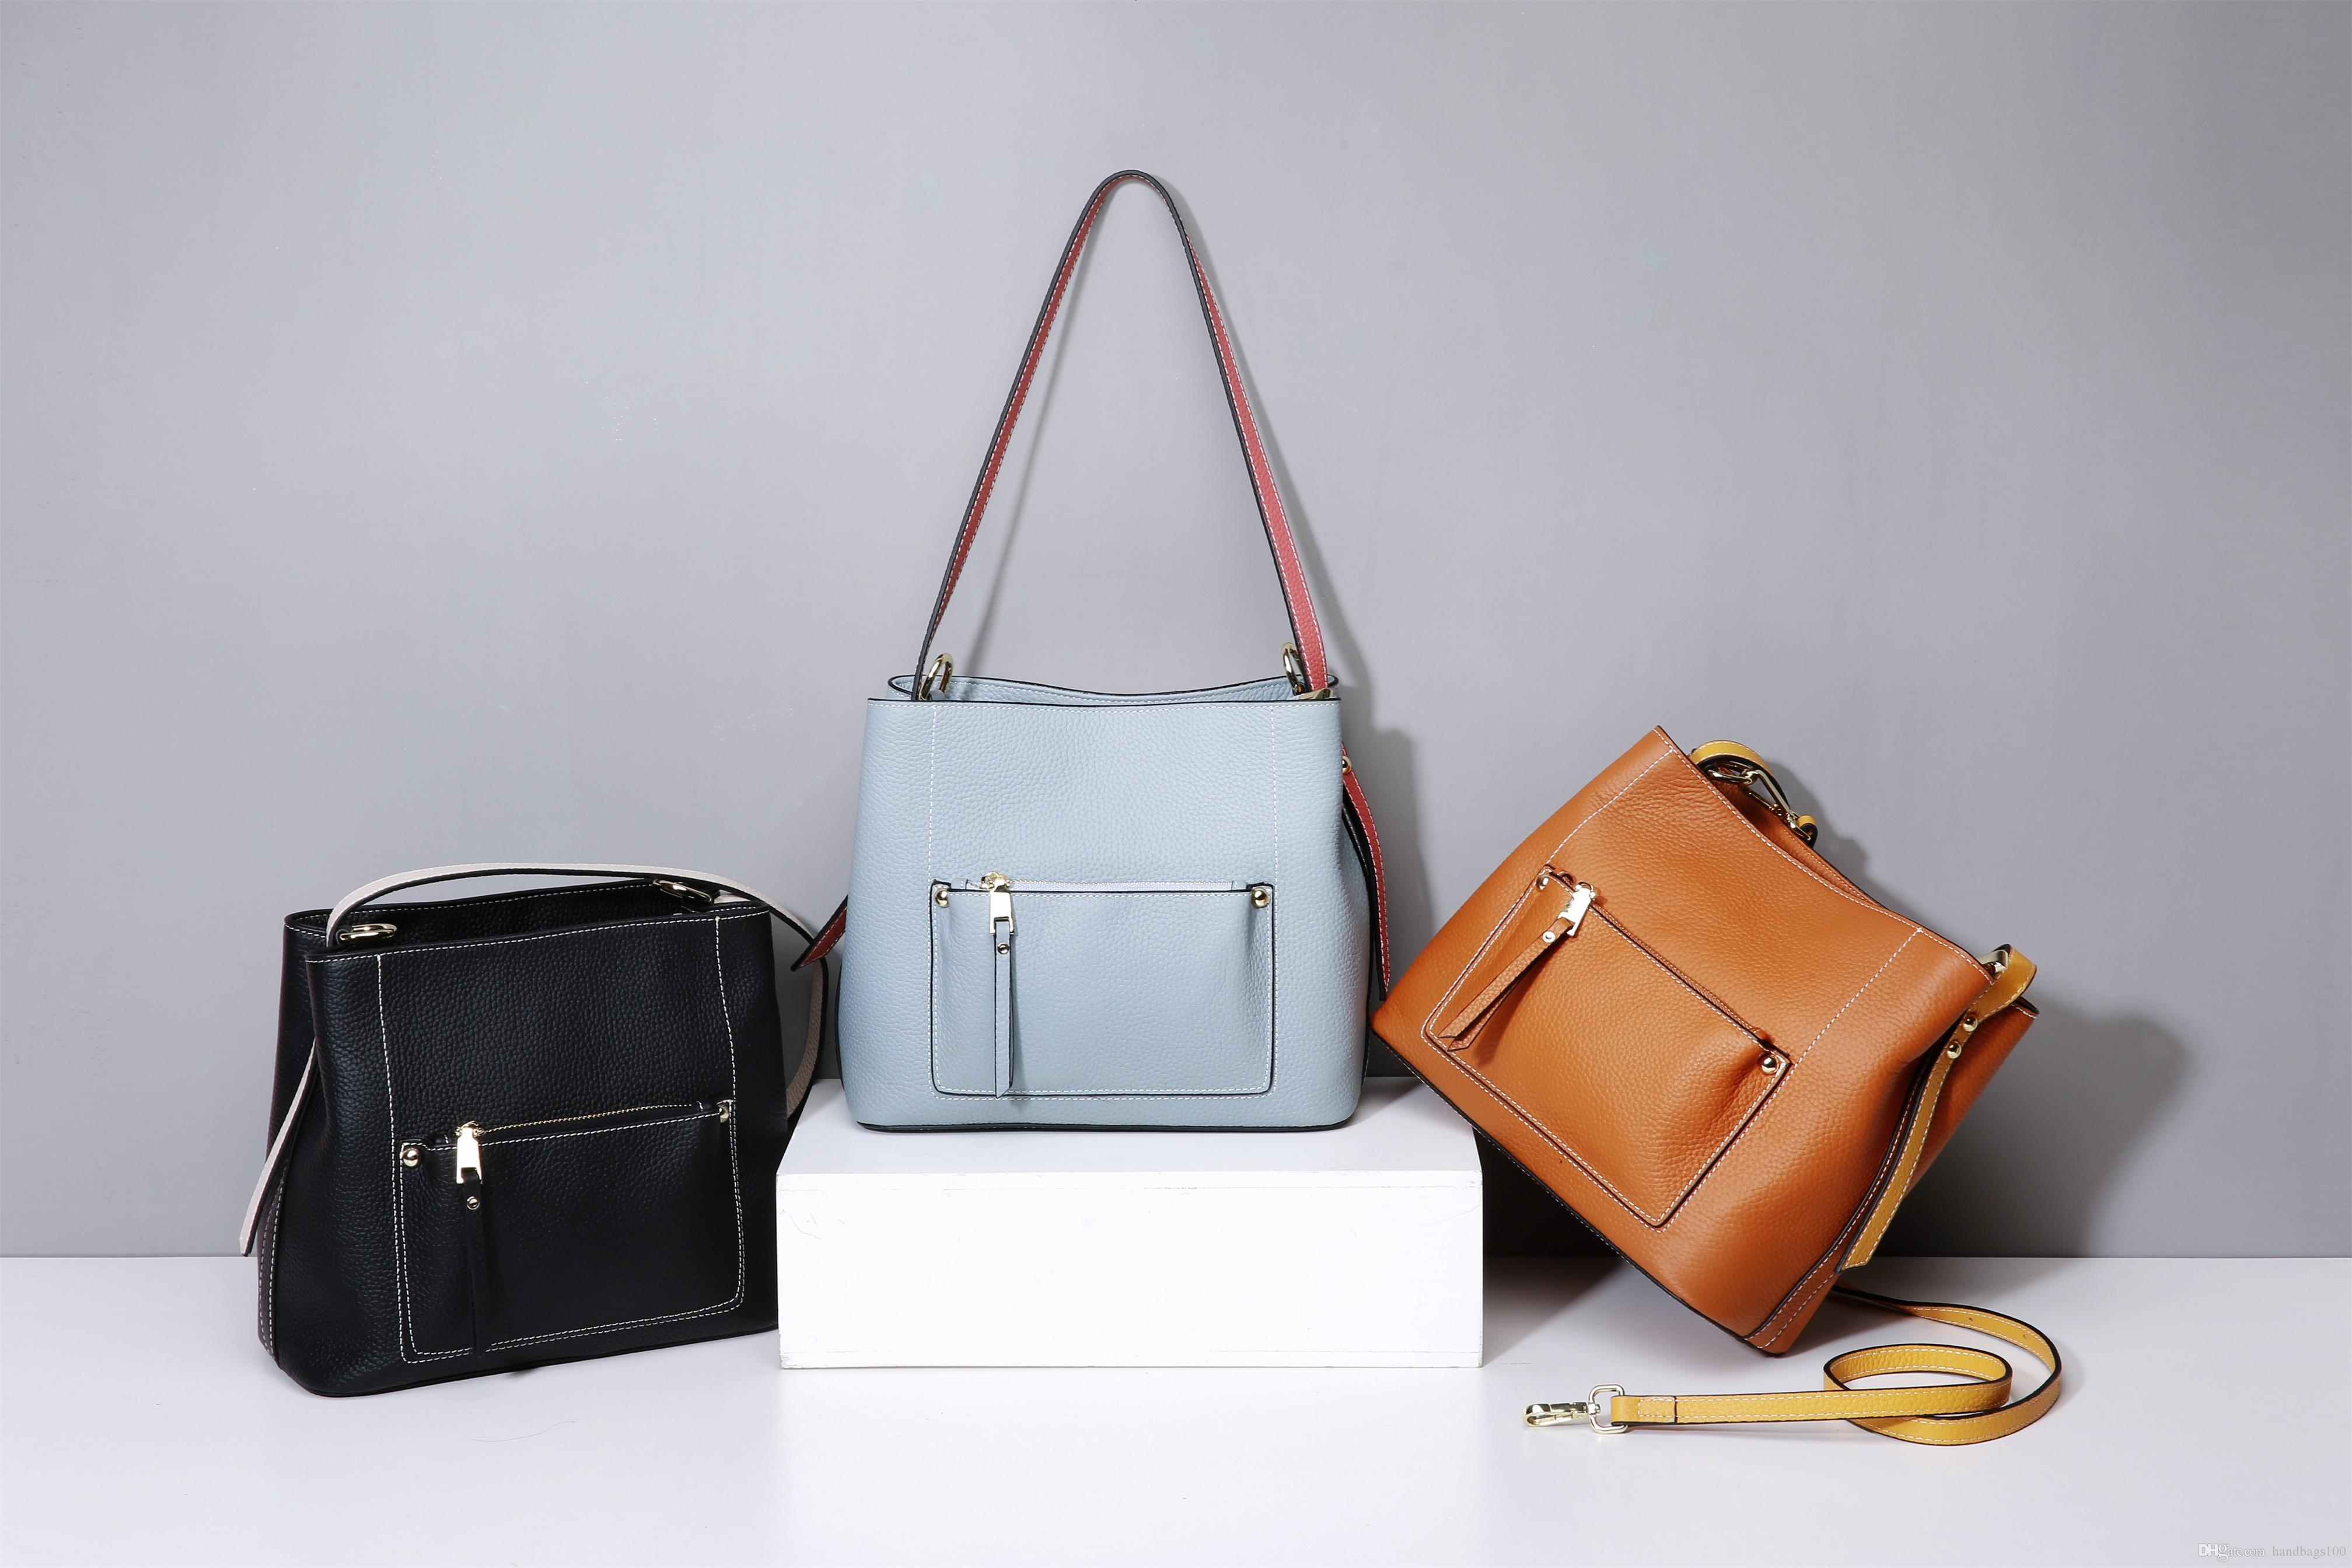 Genuine Leather Hot Sale Fashion Vintage Handbags Women Bags ... 312802466dbe6